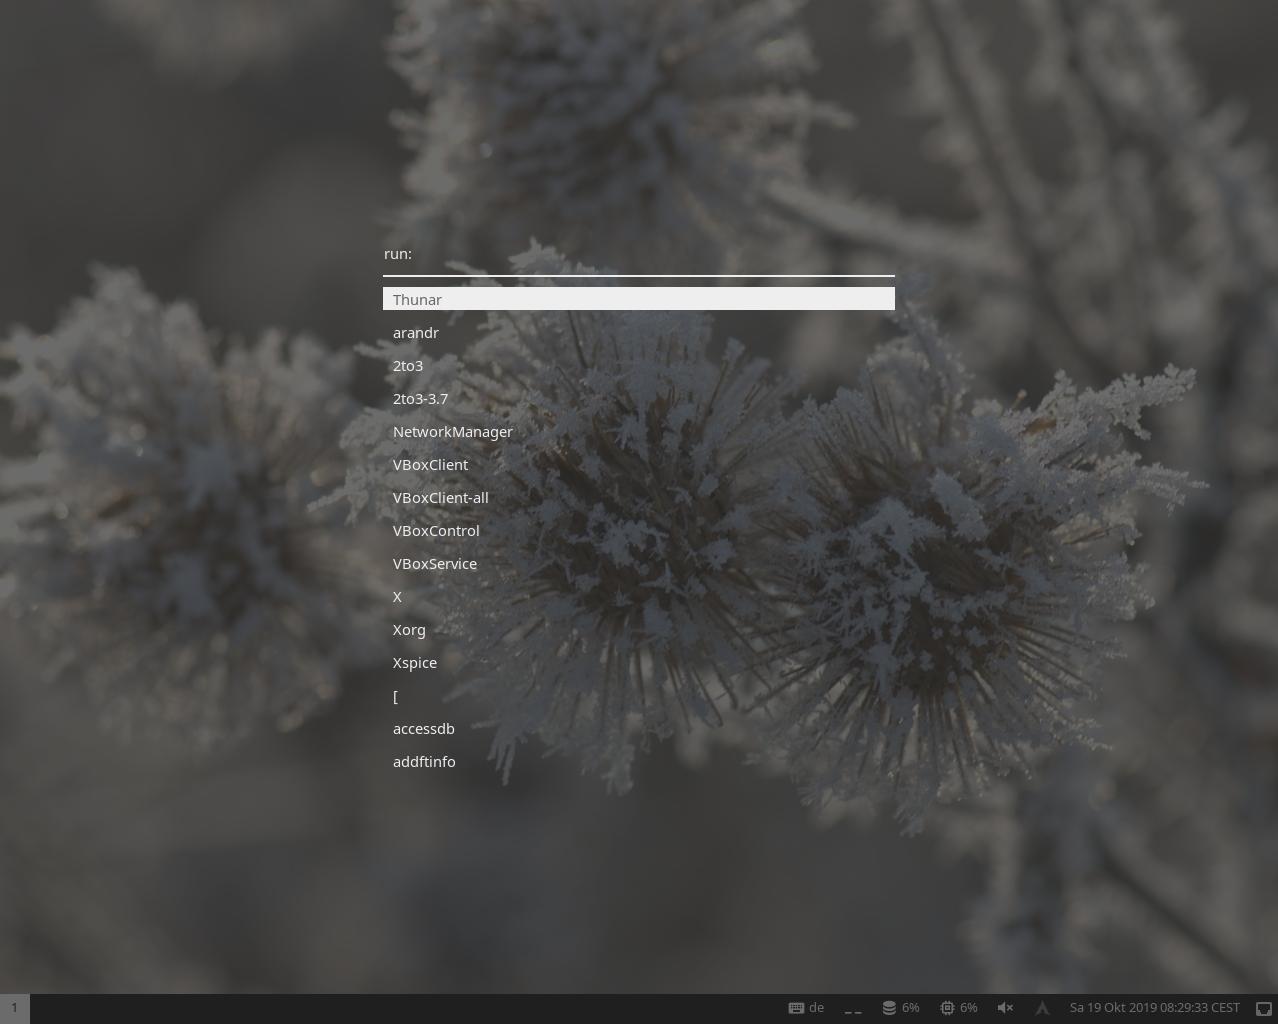 screenshot of application launcher